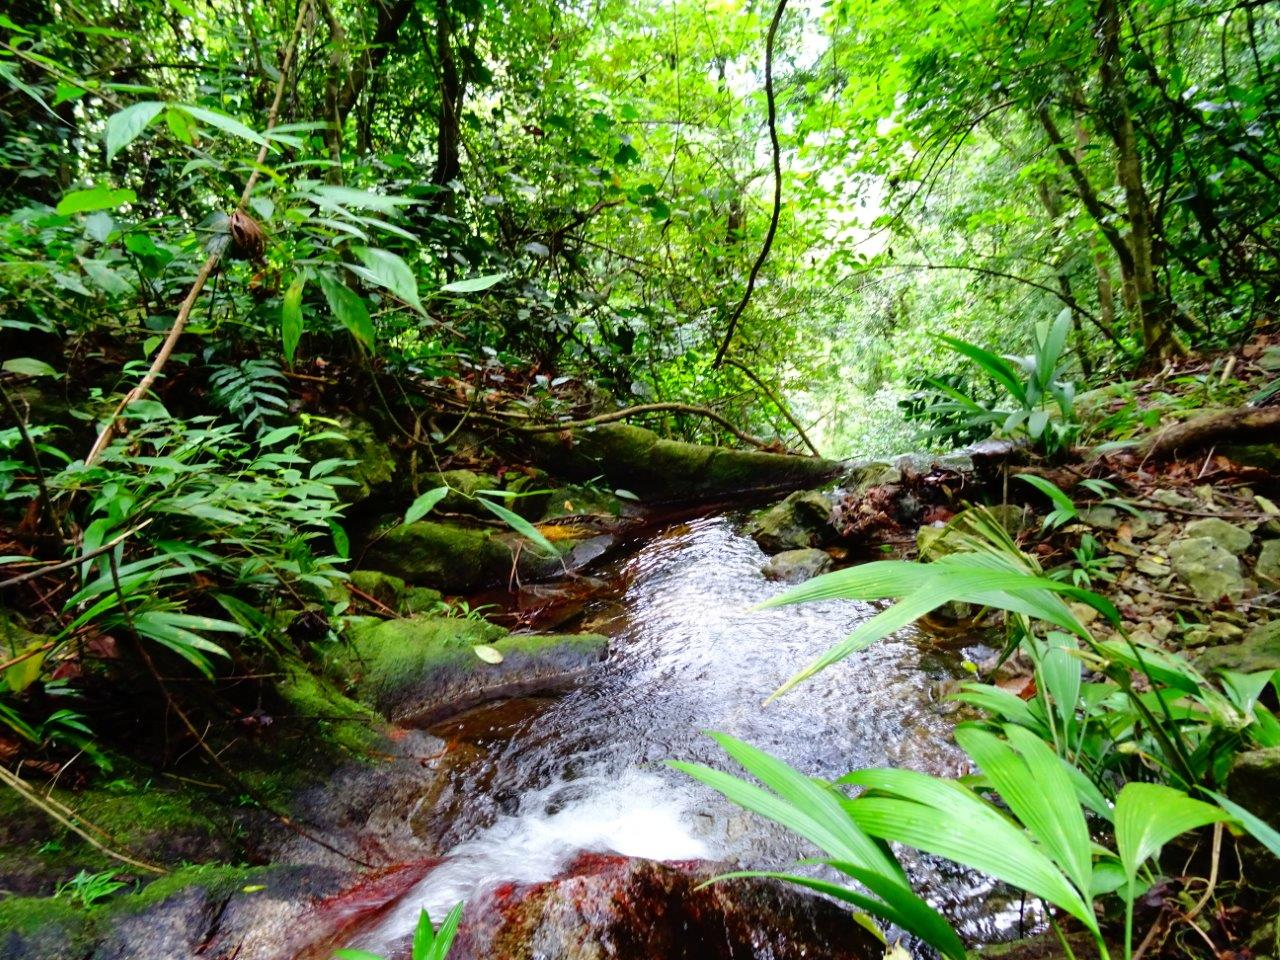 Ontdek authentiek Guatemala Jungle Hike